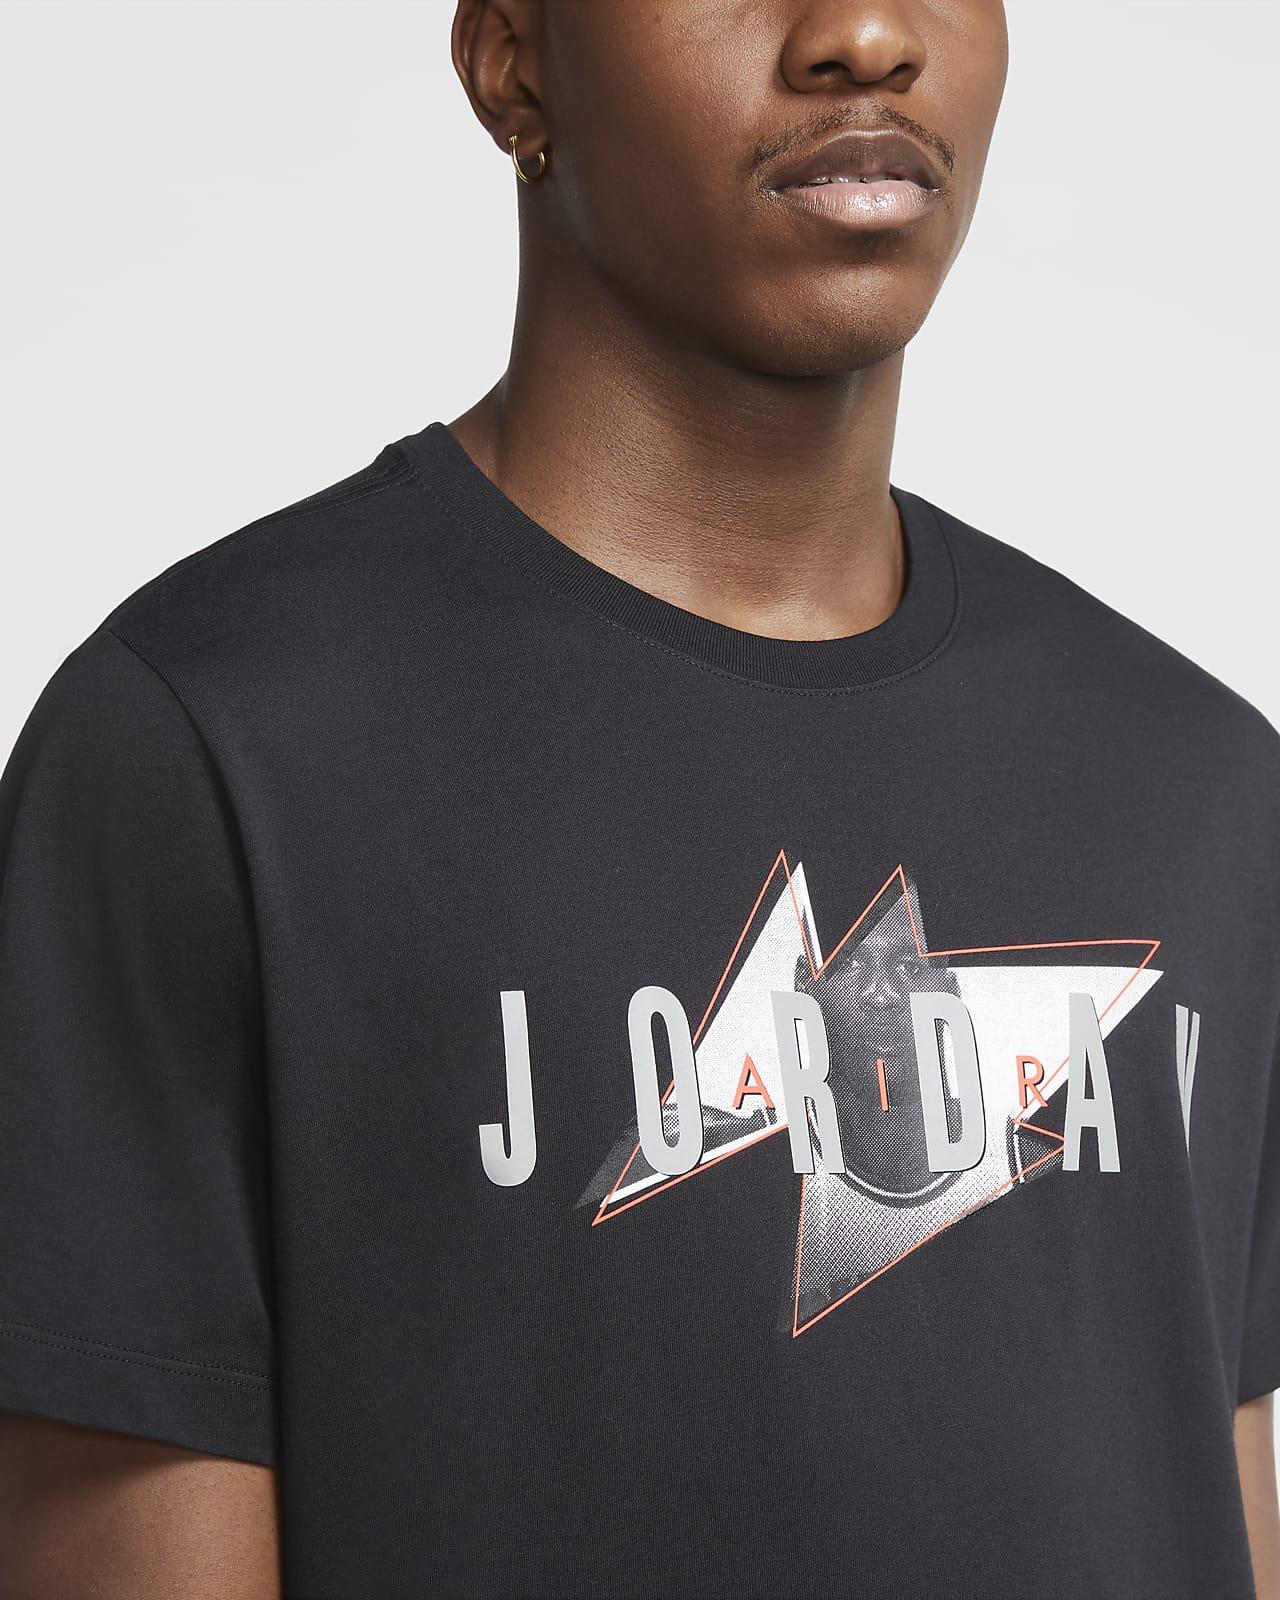 Jordan Men's Graphic T-Shirt. Nike AU